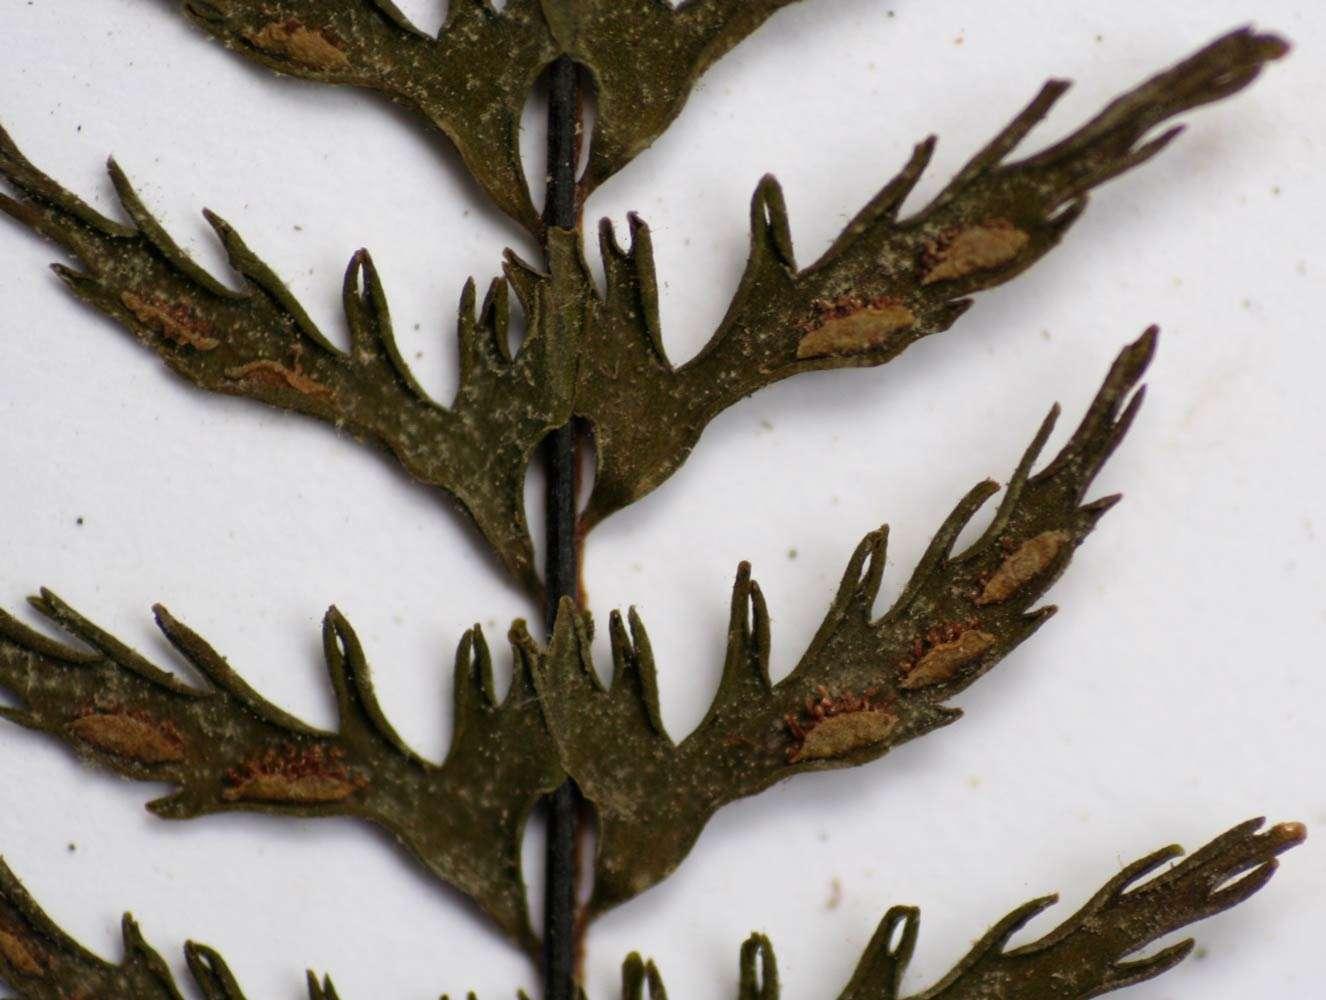 Image of showy spleenwort